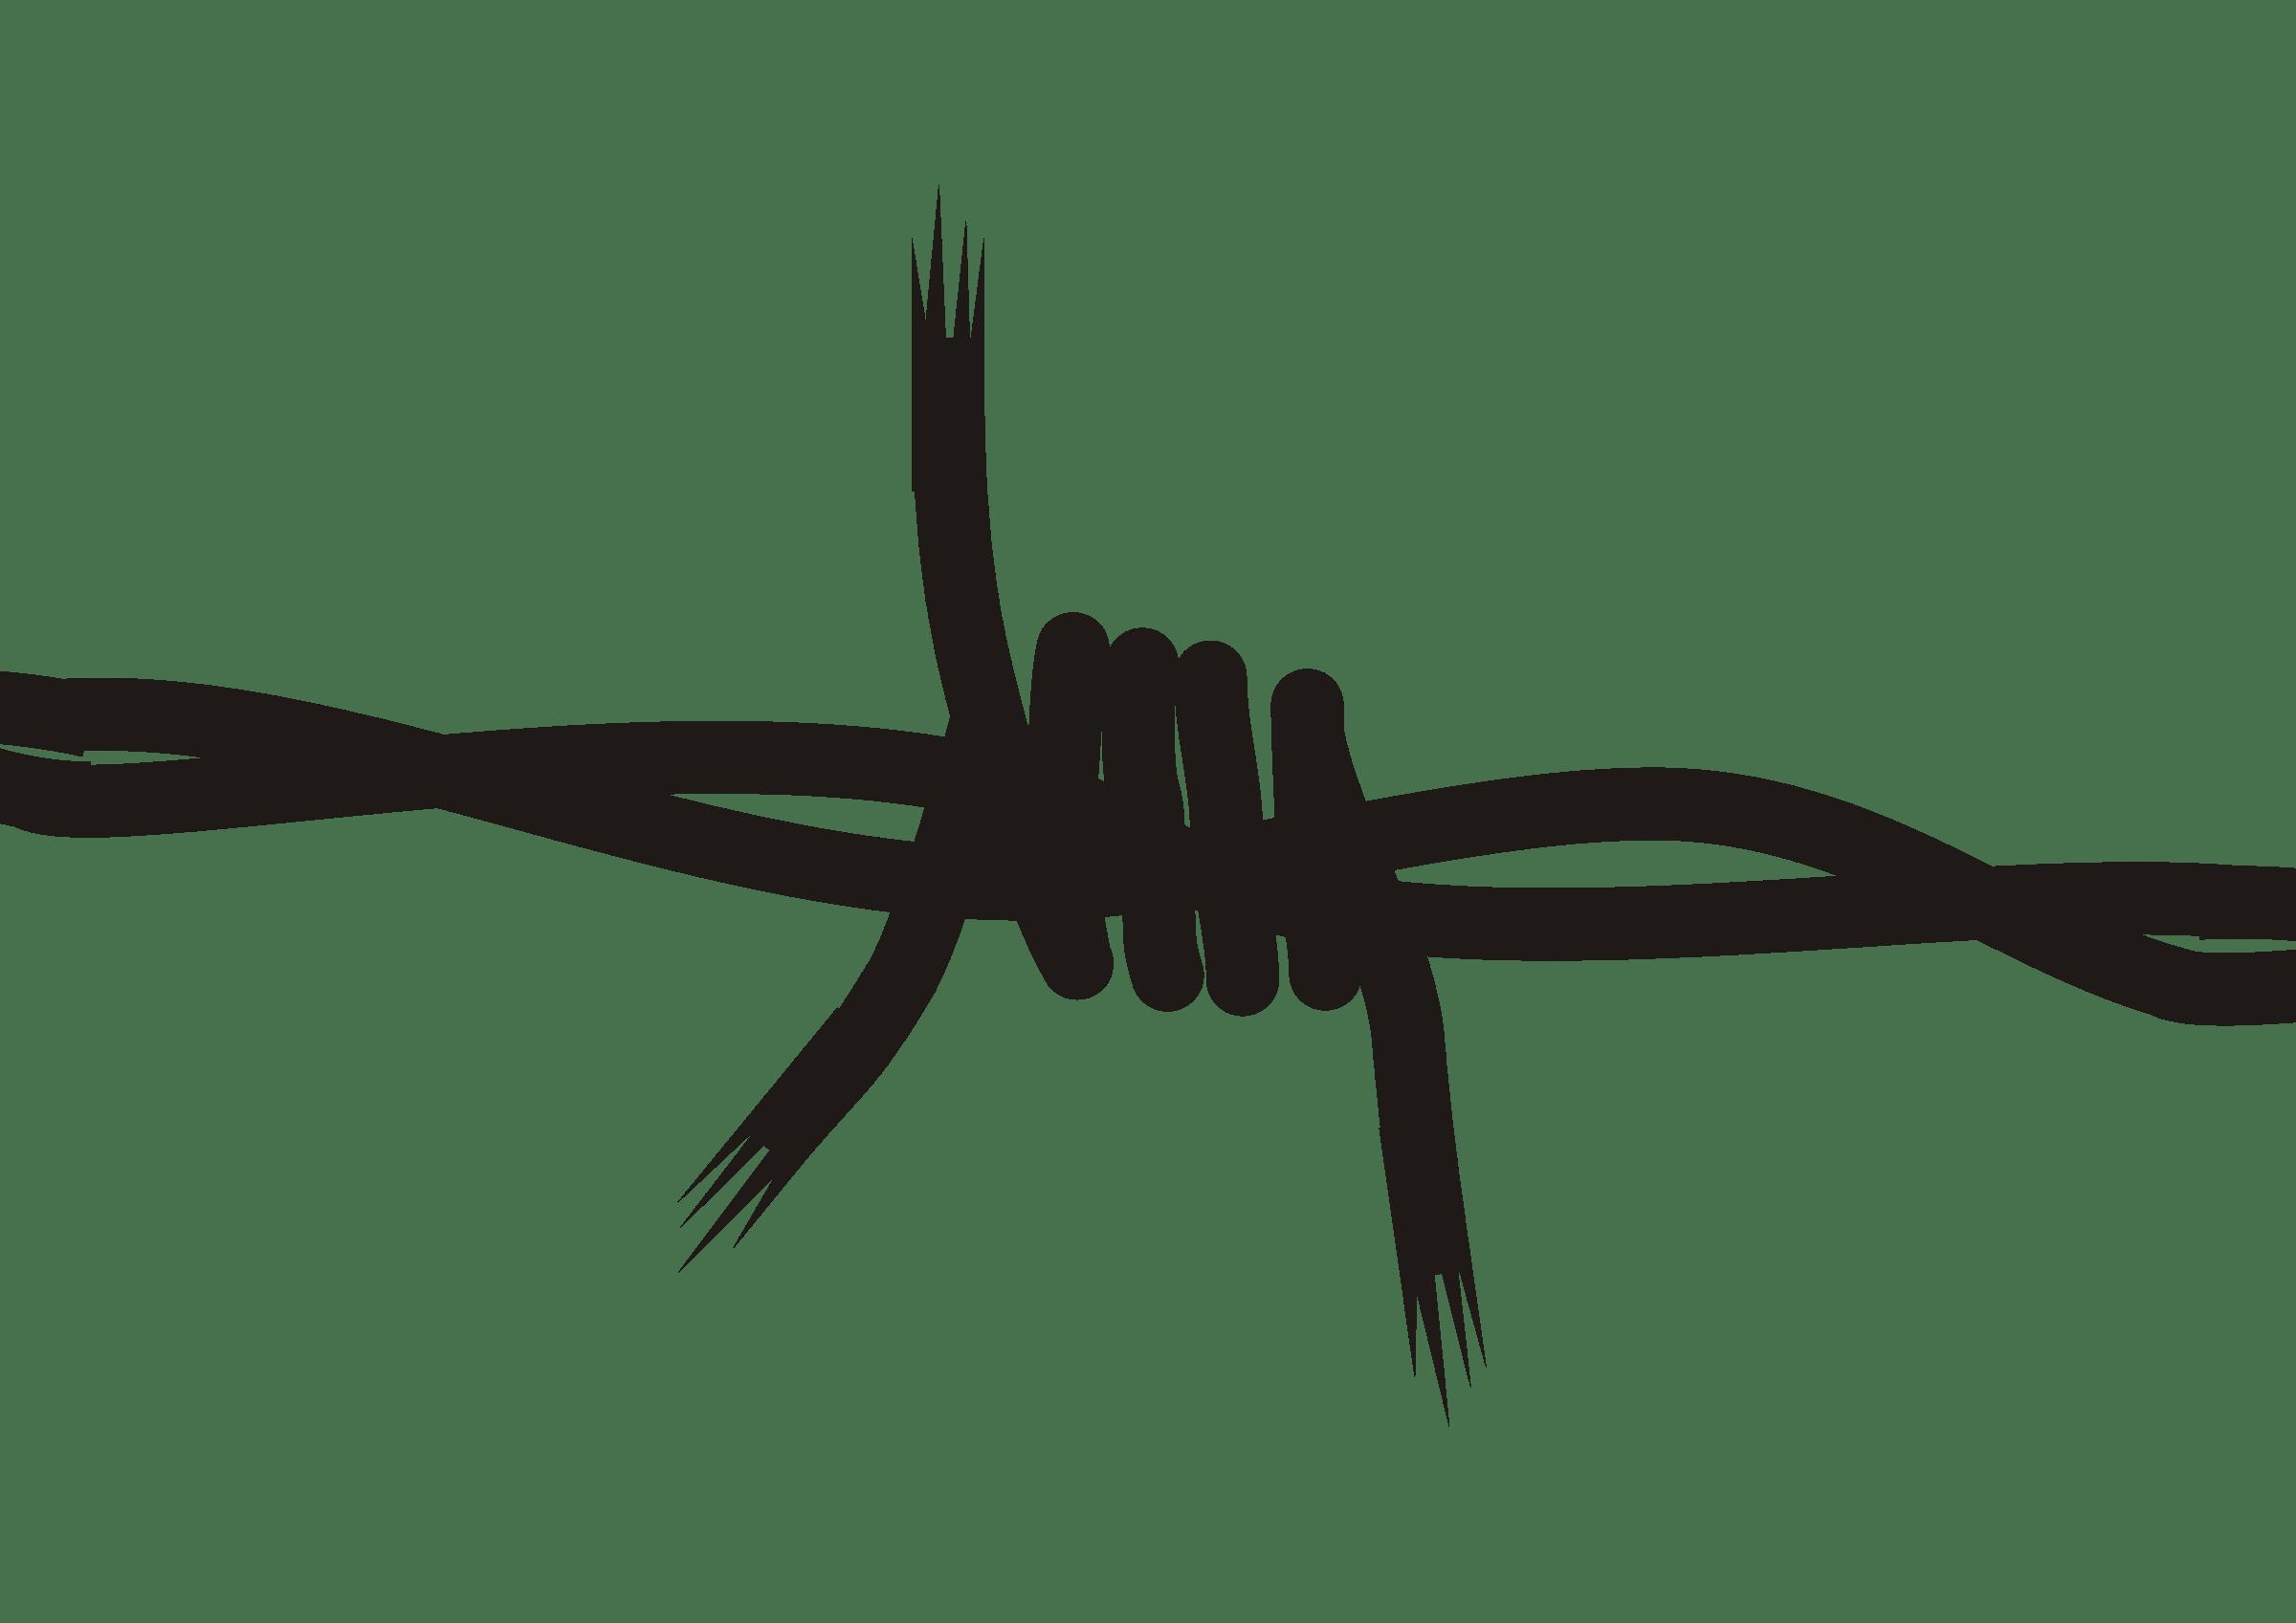 Barbwire Clipart